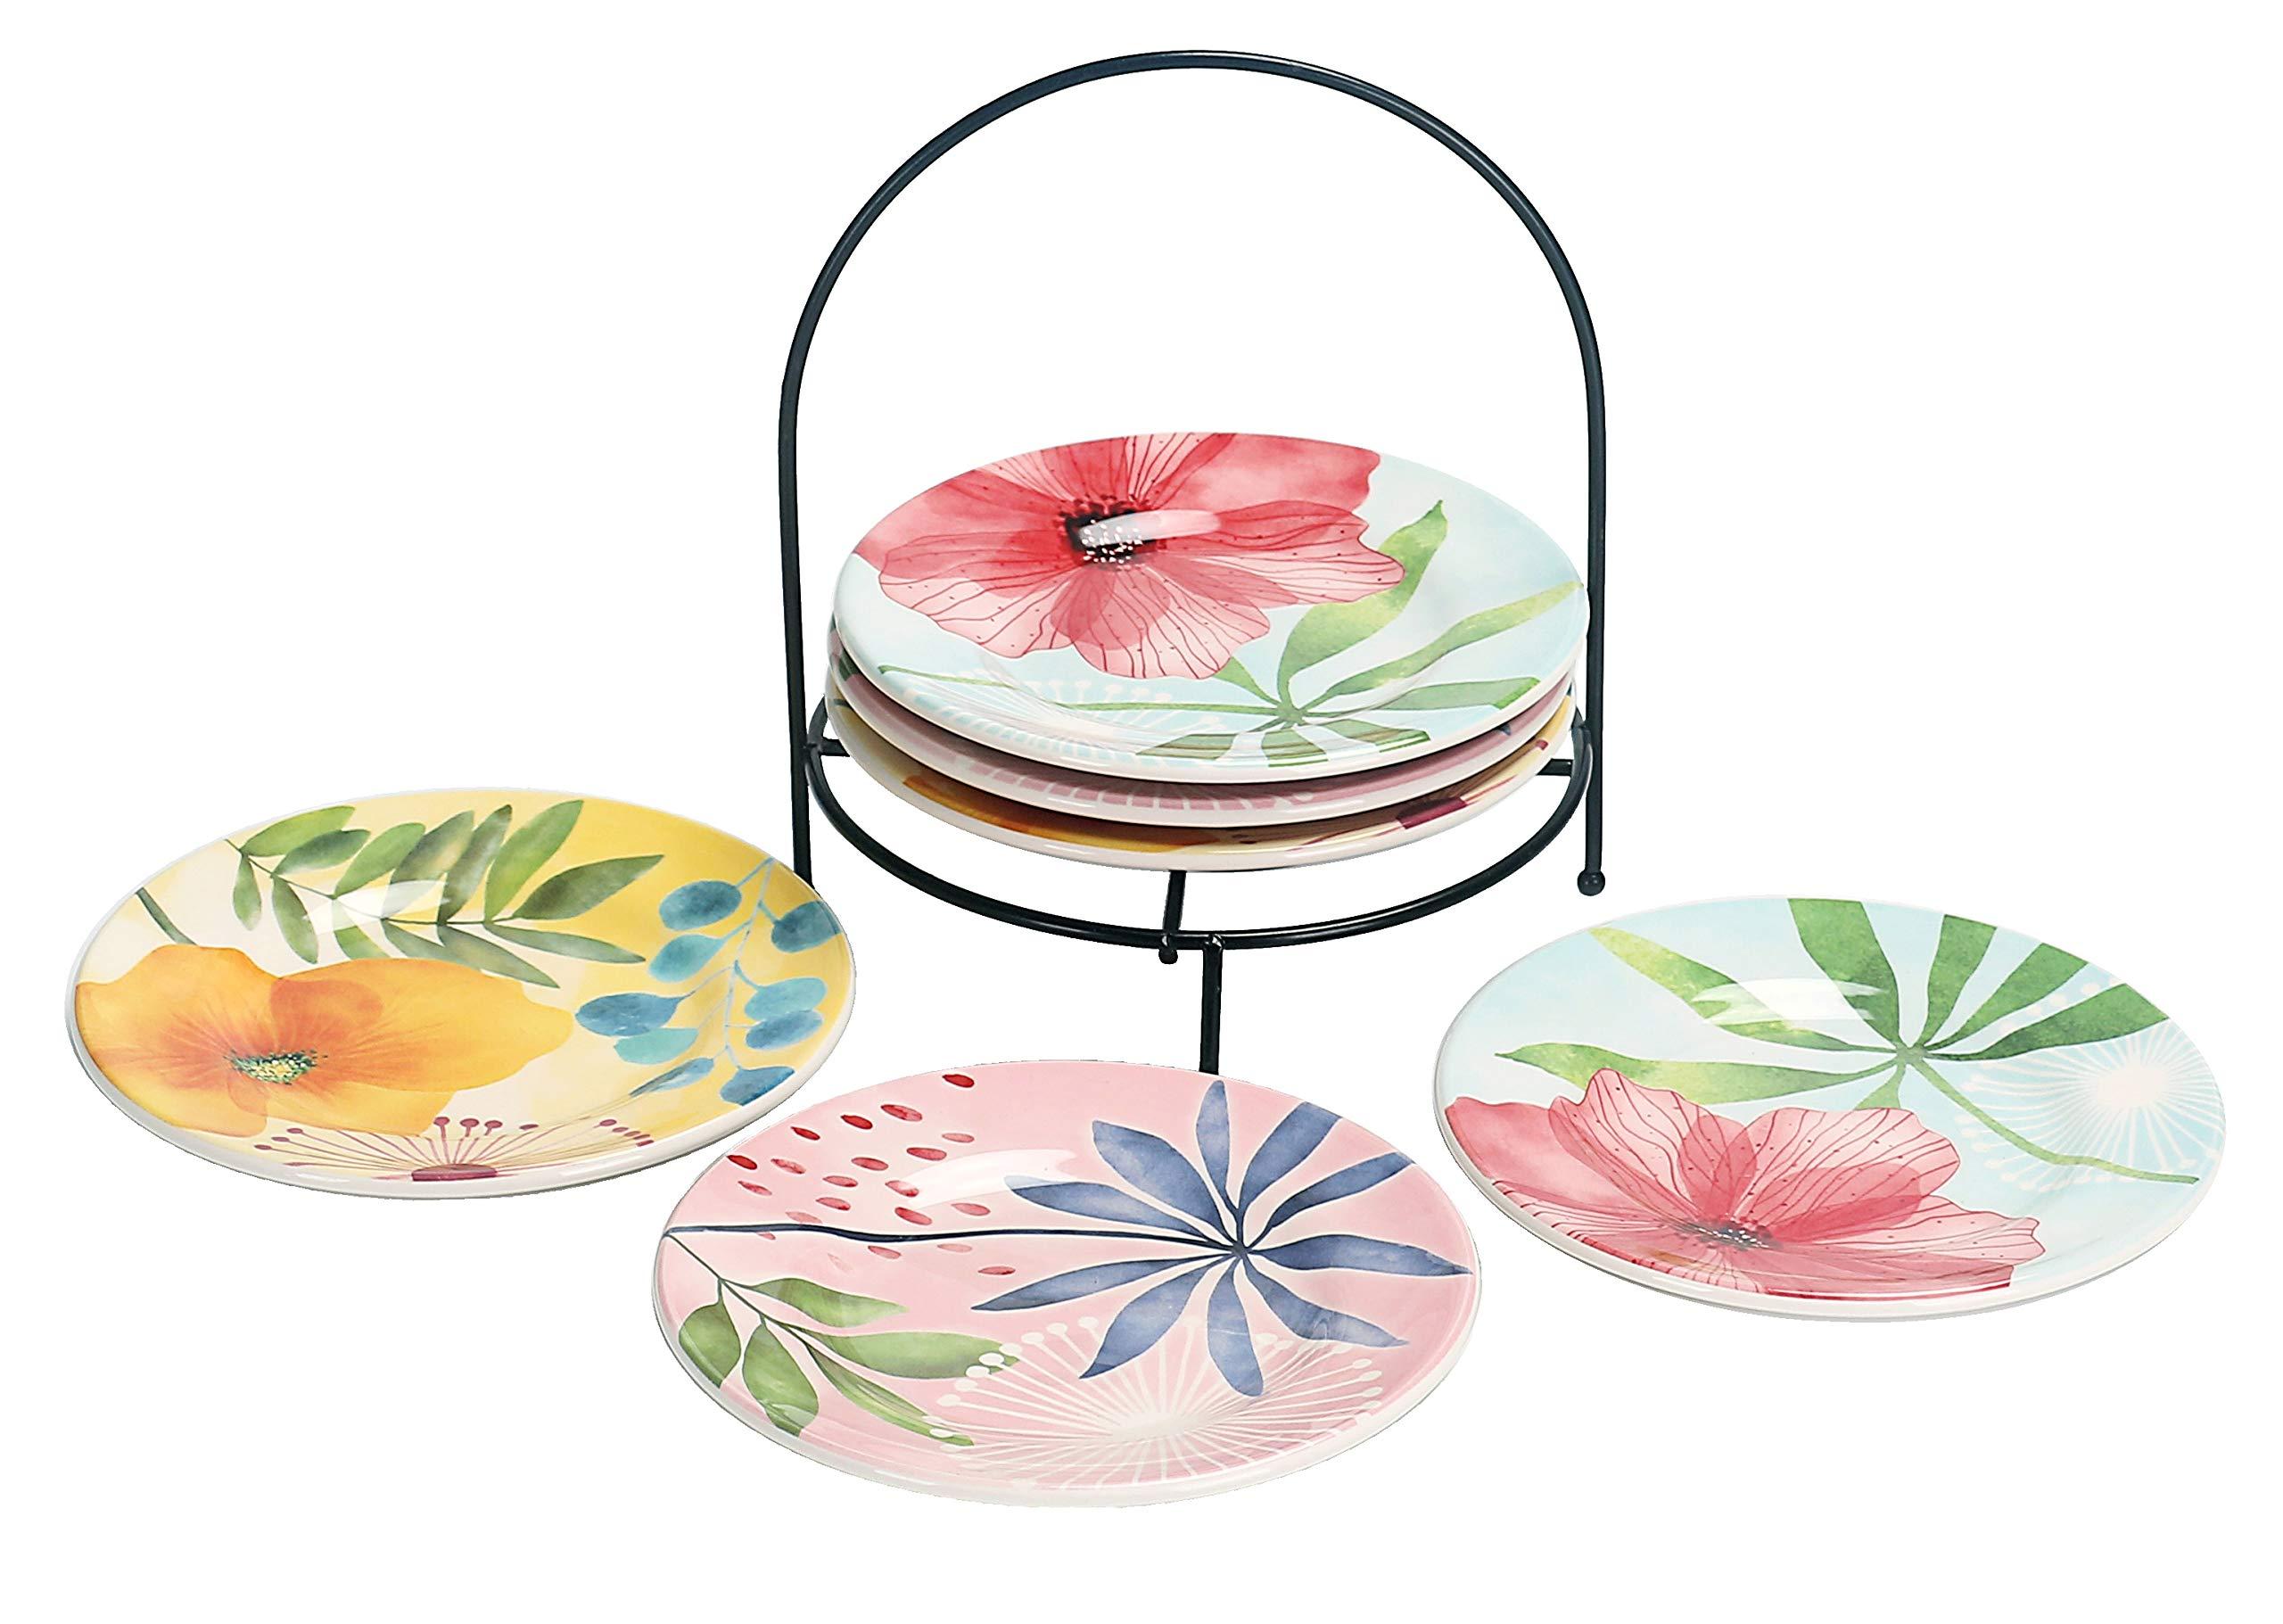 Bico Flower Carnival 6 inch Ceramic Appetizer Plate with Rack, Set of 7, for Salad, Appetizer, Snacks, Plates Microwave & Dishwasher Safe